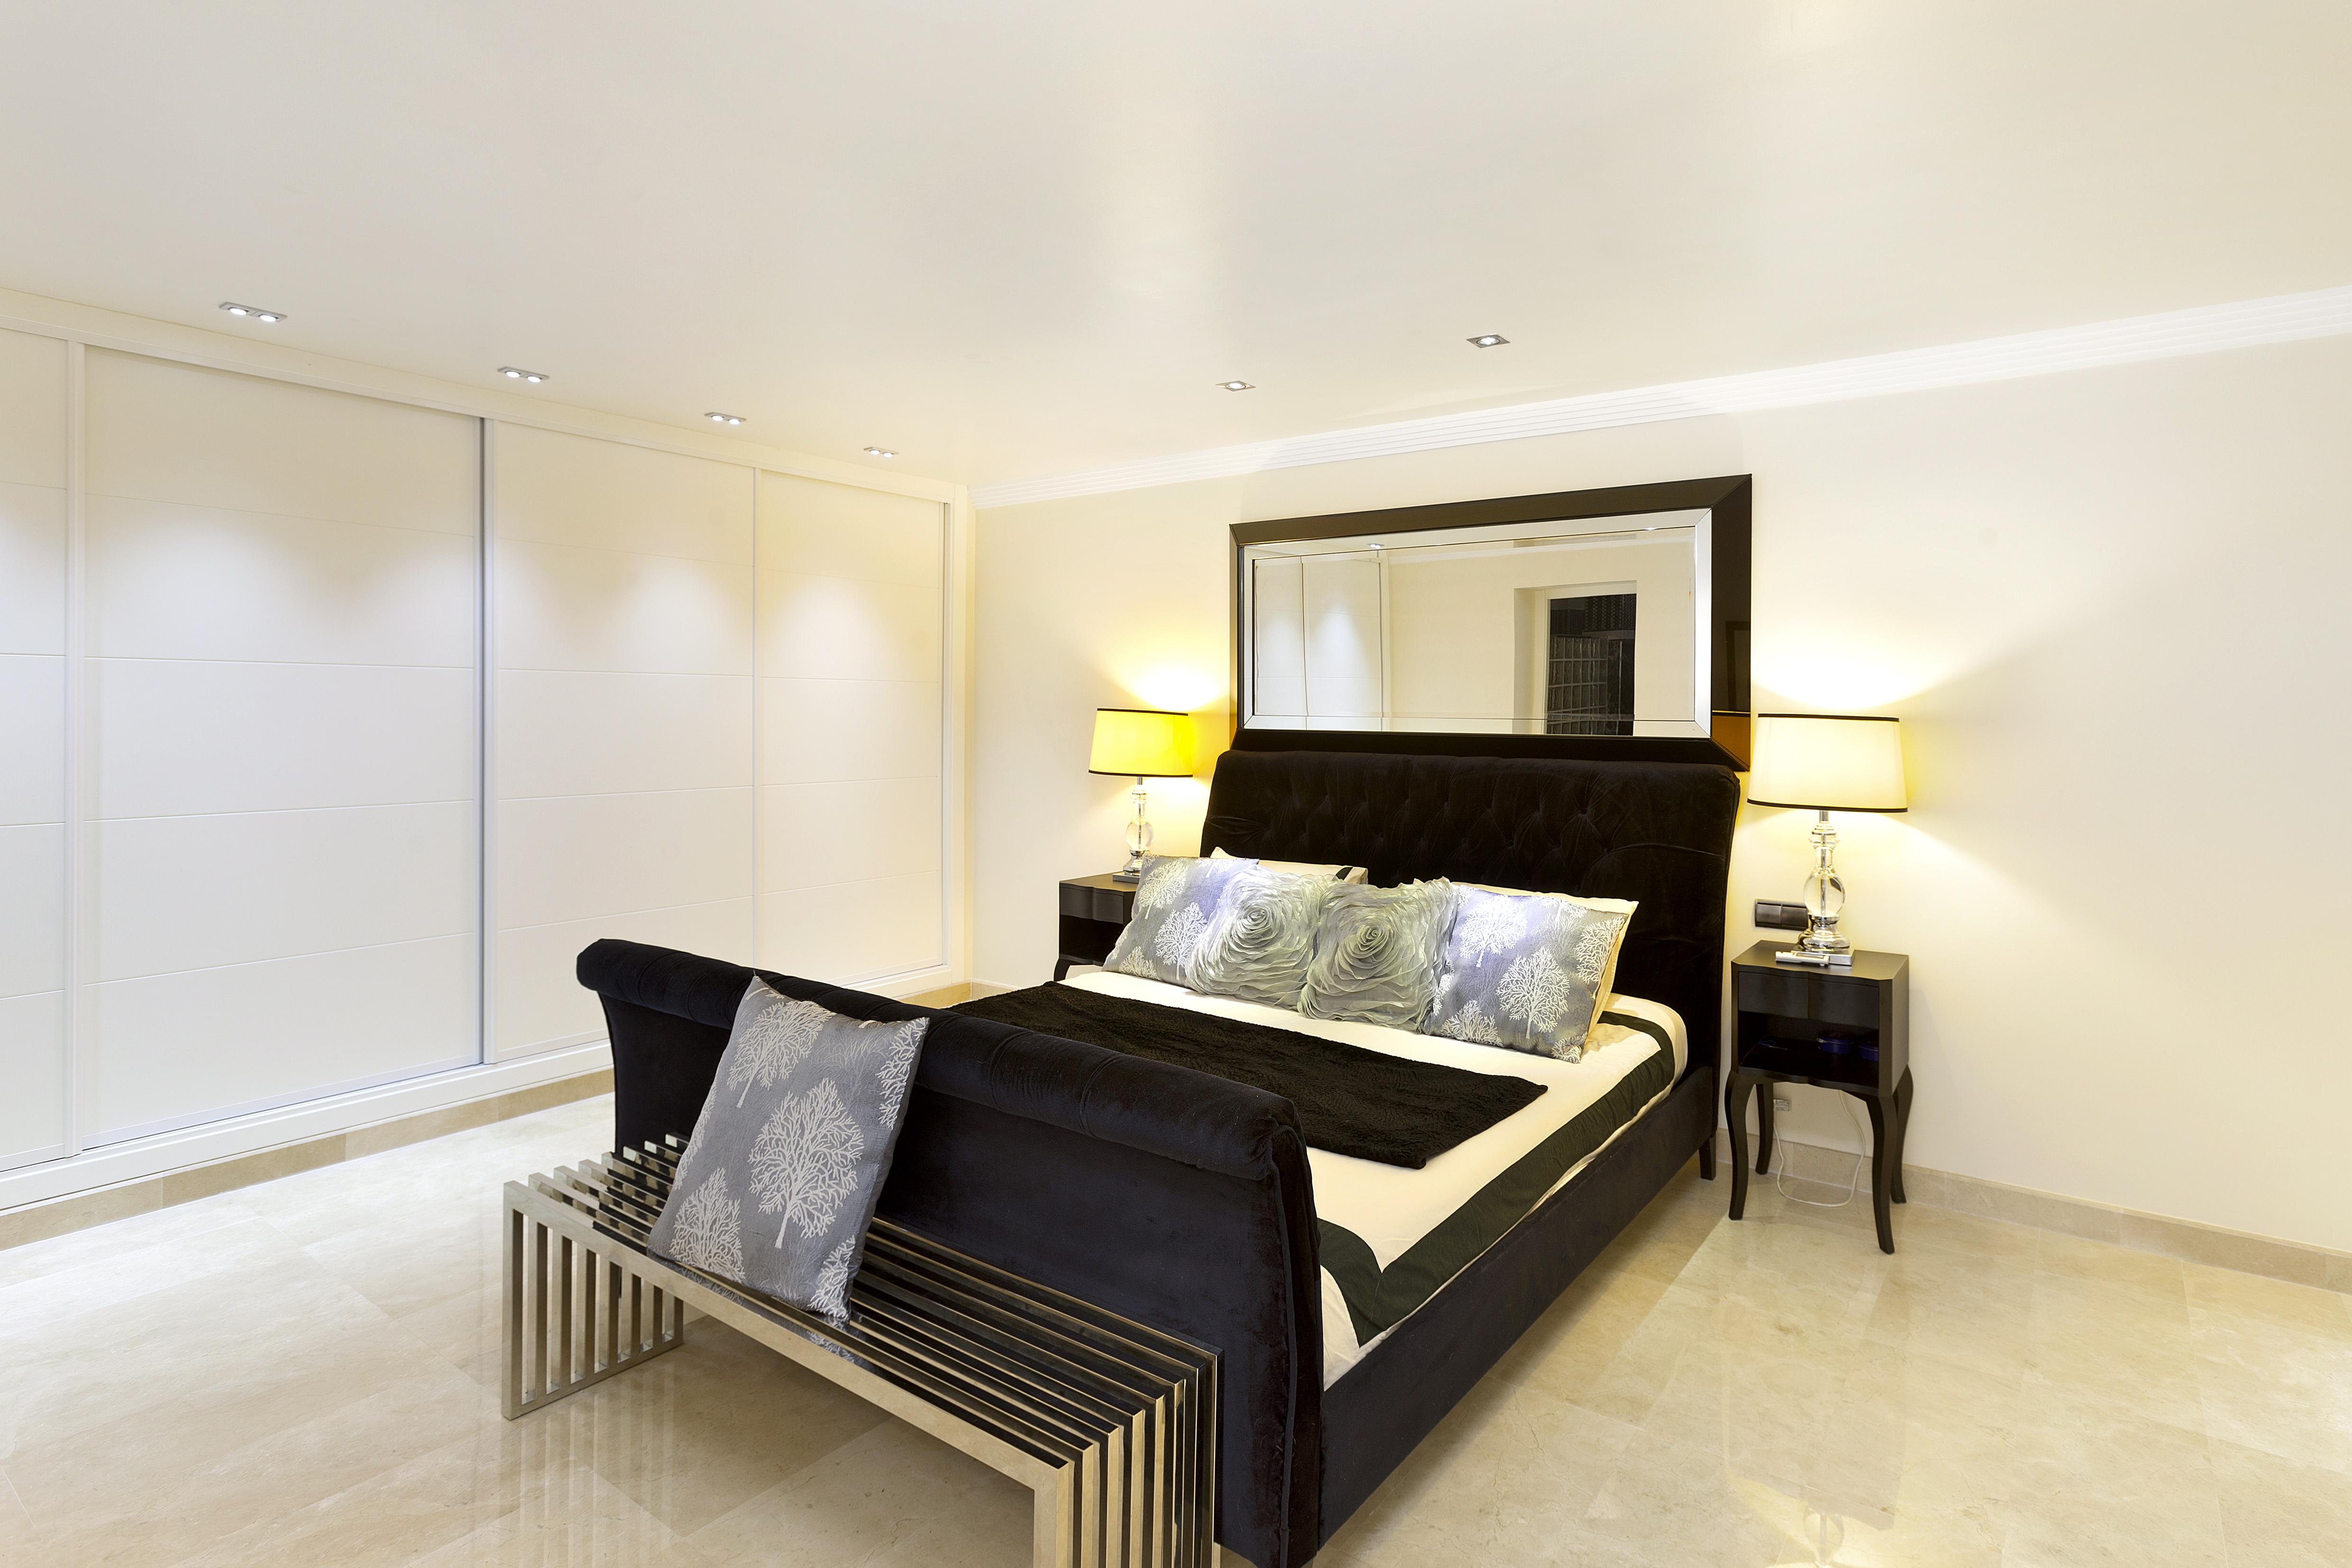 Picture of: Villa In Marbella 361 02124p Real Estate Spain Top Service Serneholt Estate